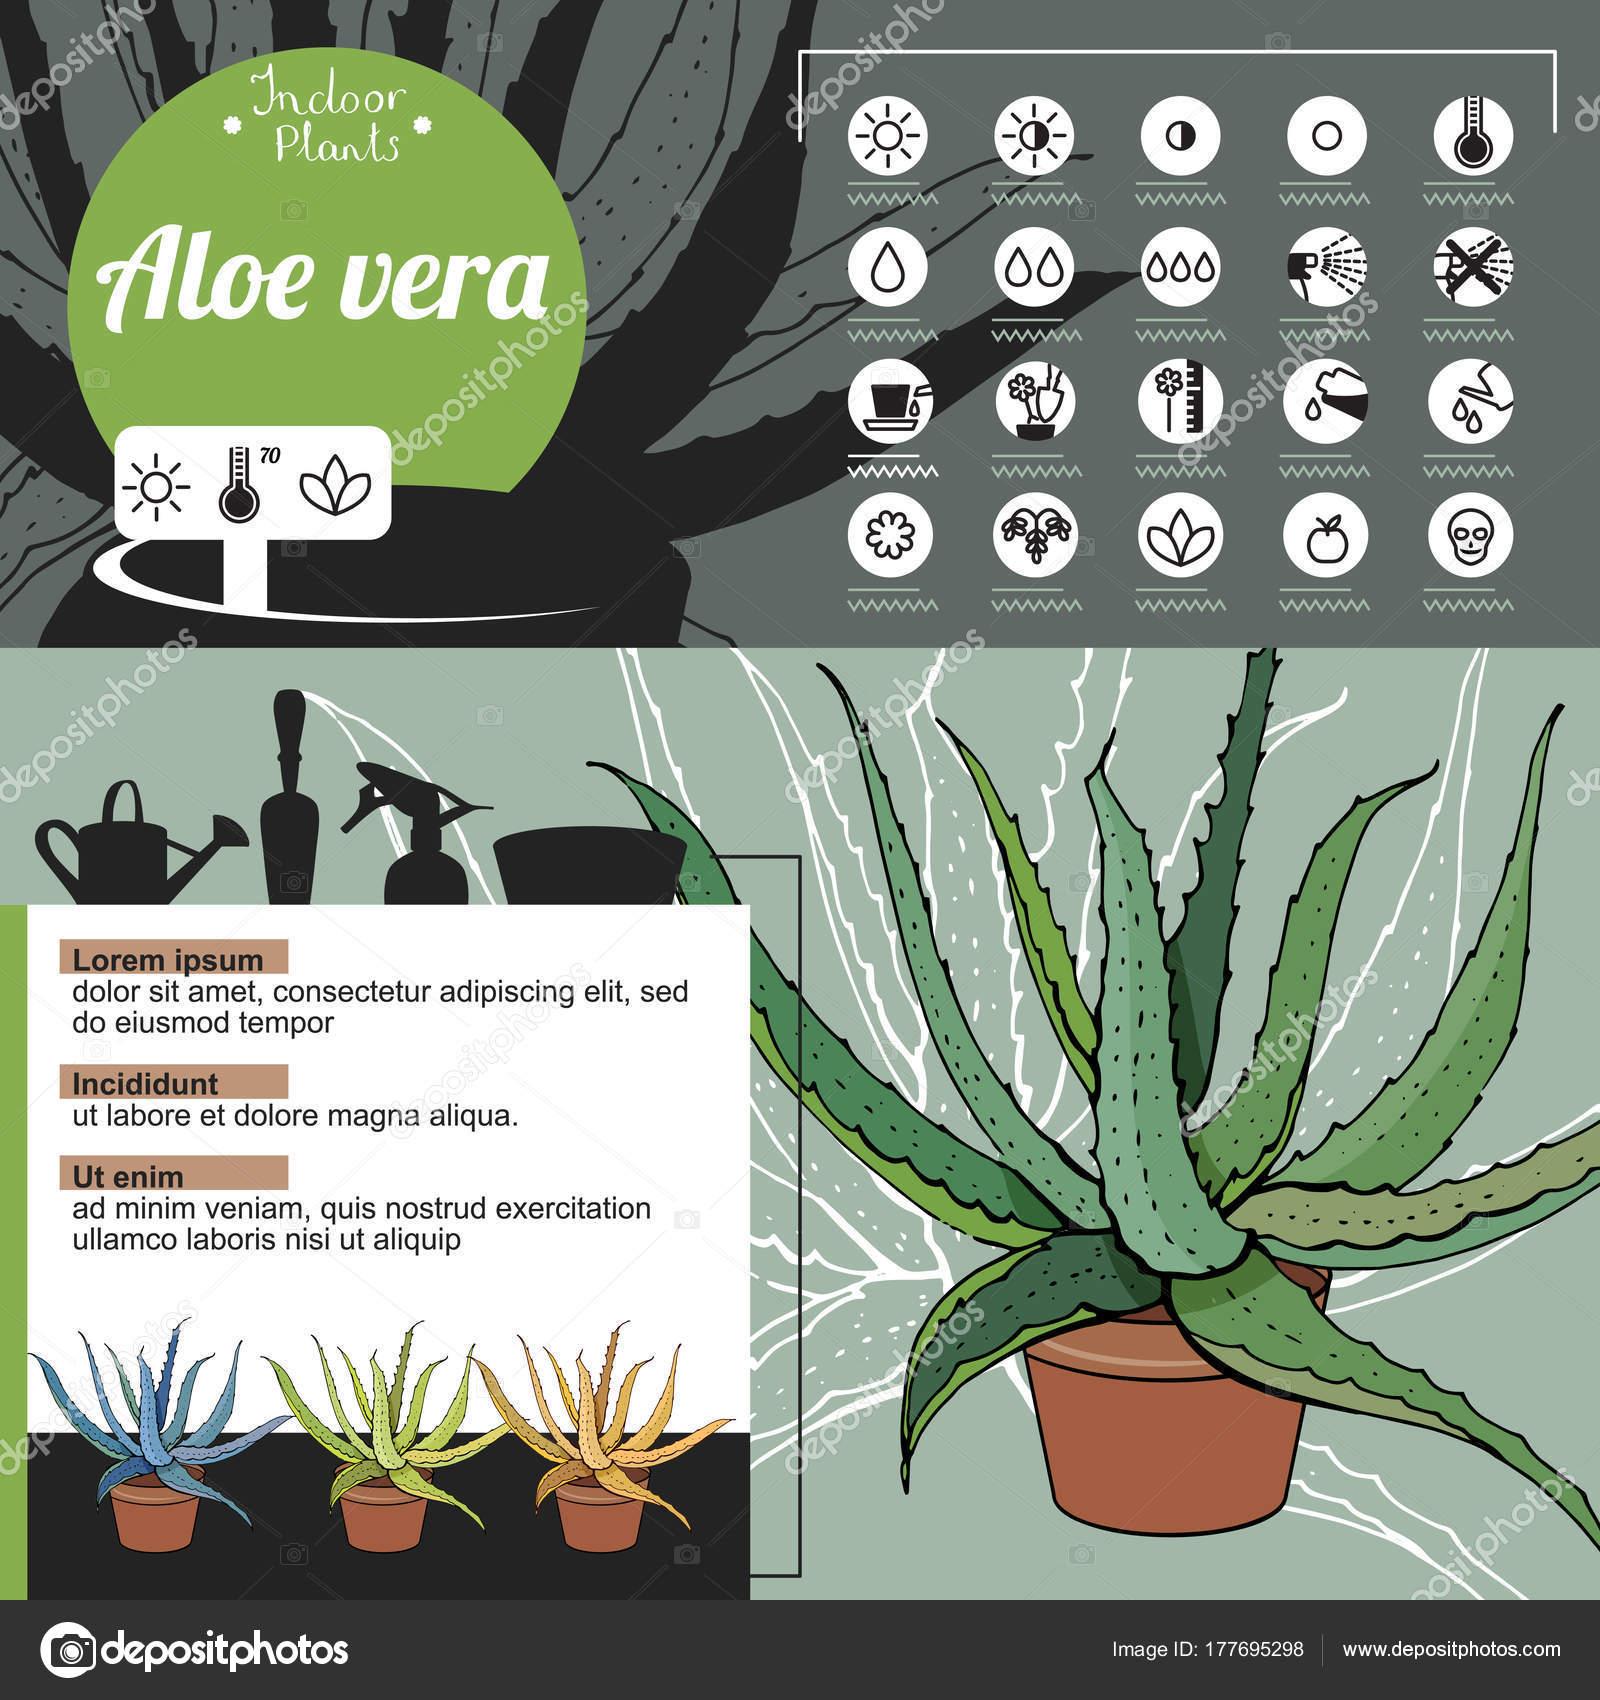 https://st3.depositphotos.com/1001377/17769/v/1600/depositphotos_177695298-stock-illustration-template-indoor-plant-aloe-vera.jpg